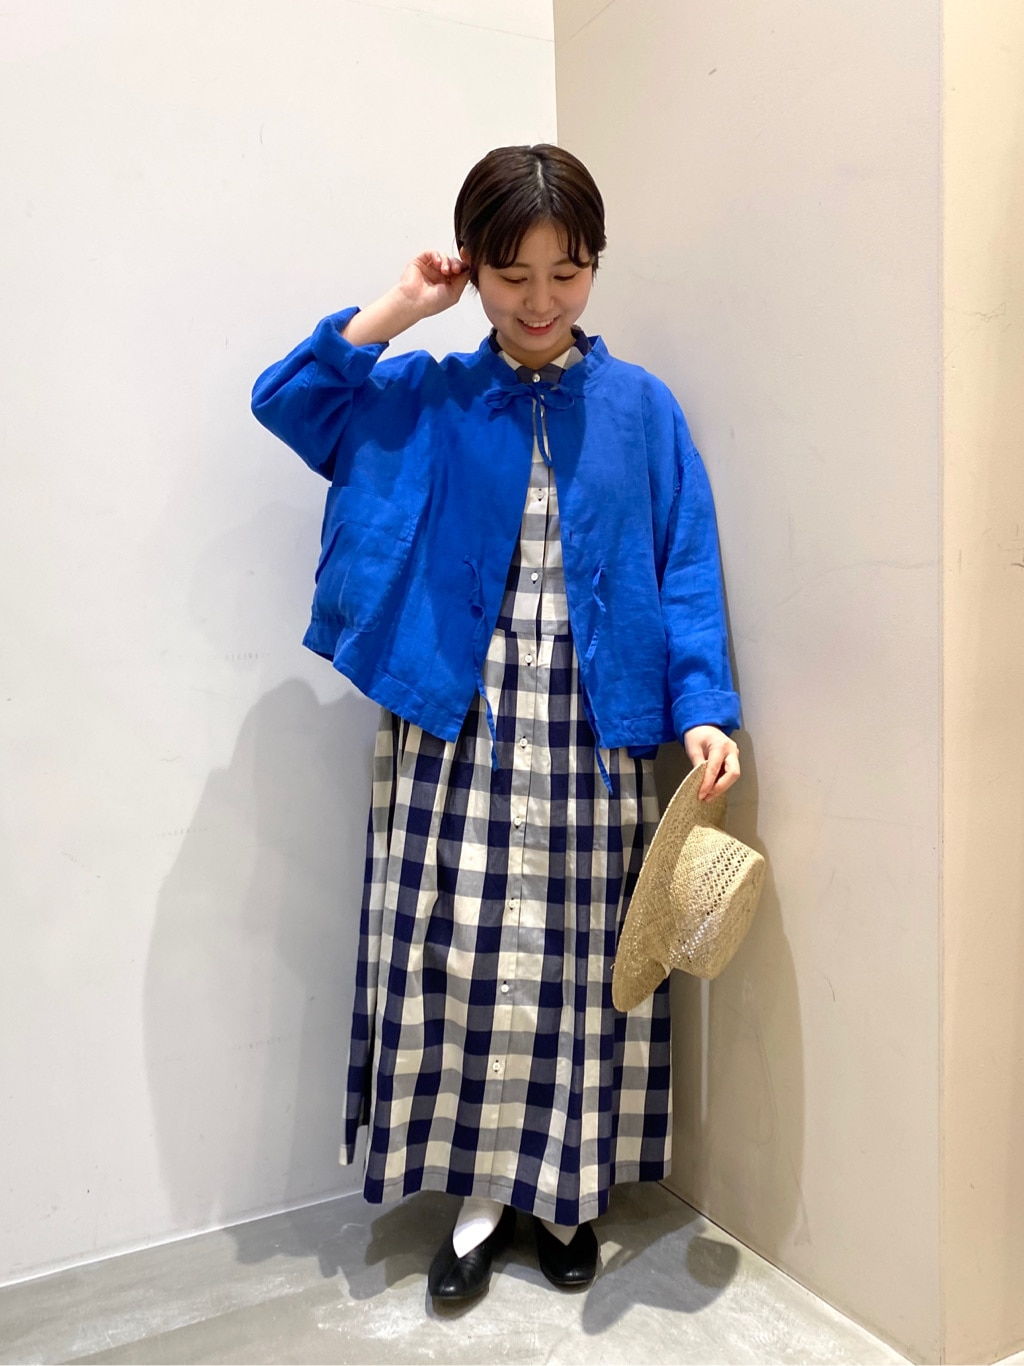 bulle de savon 阪急西宮ガーデンズ 身長:149cm 2021.04.19